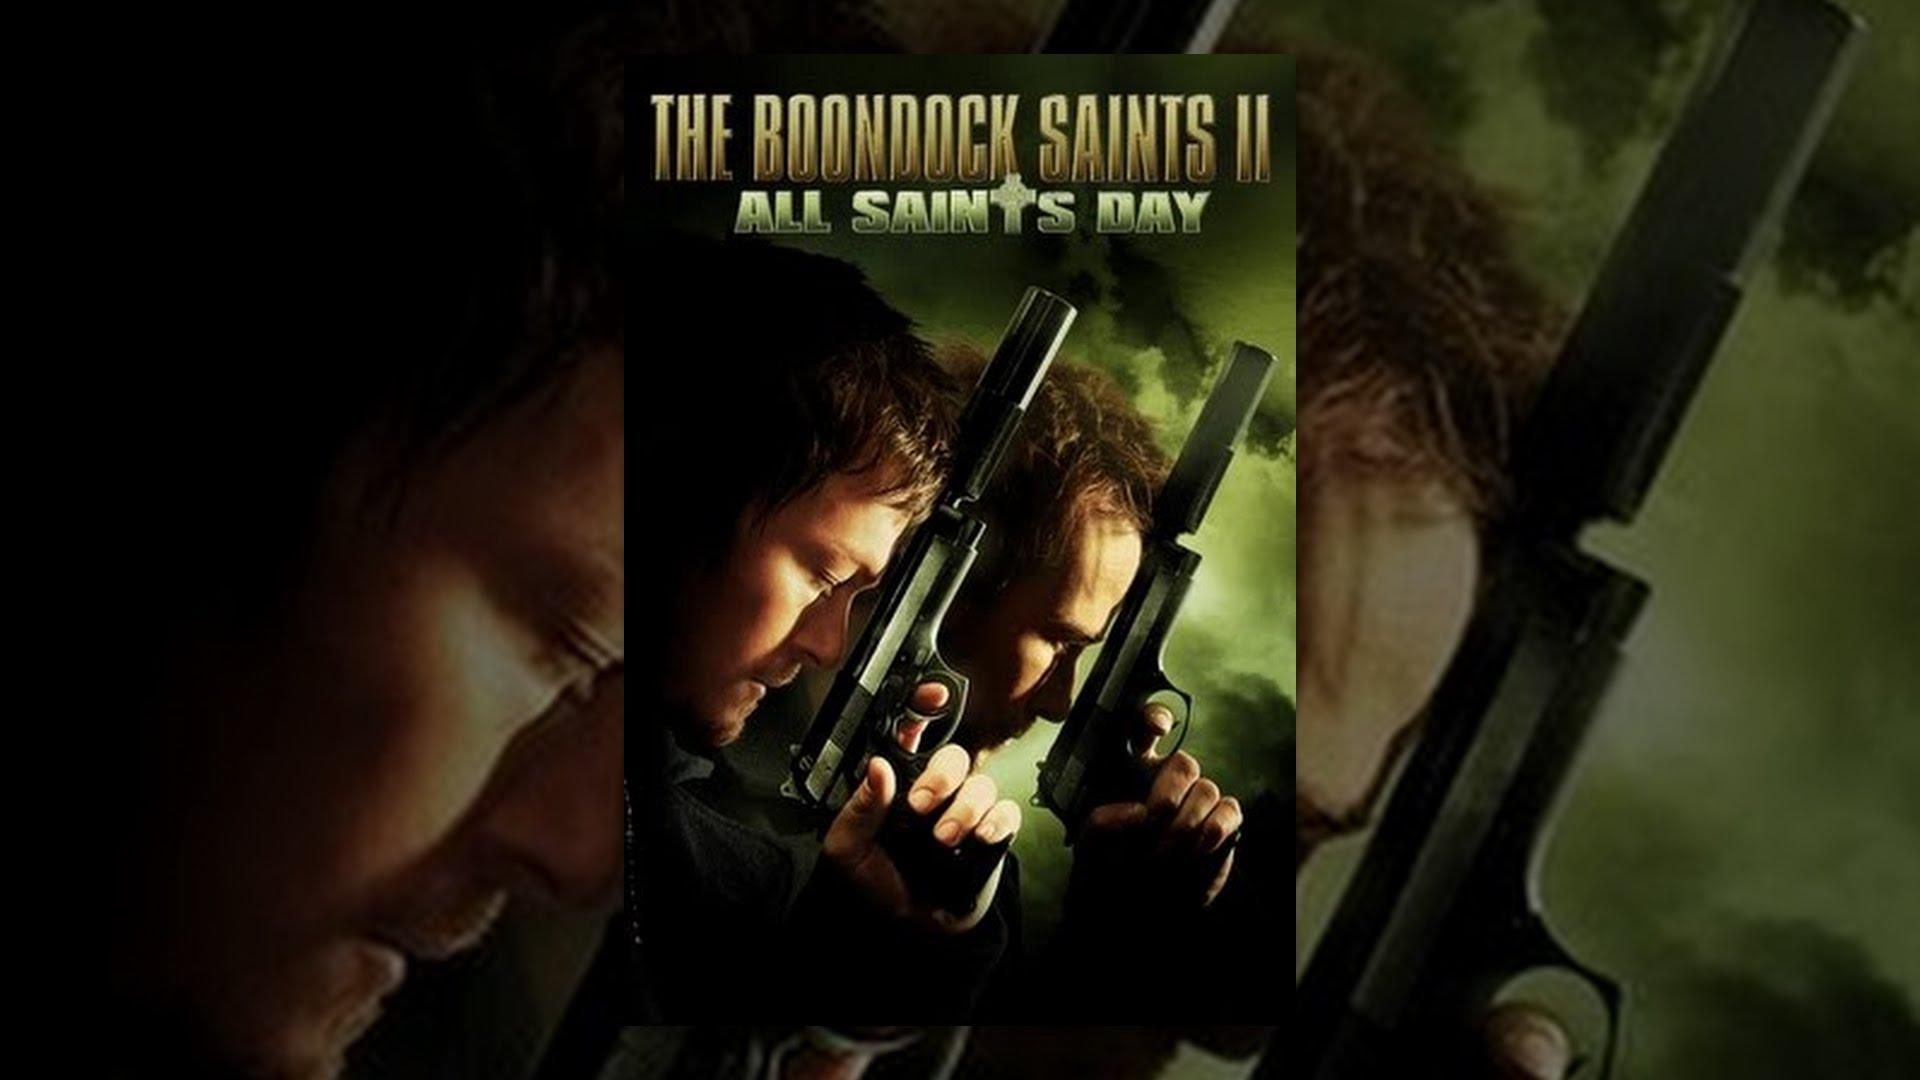 Boondock saints 3 release date in Perth